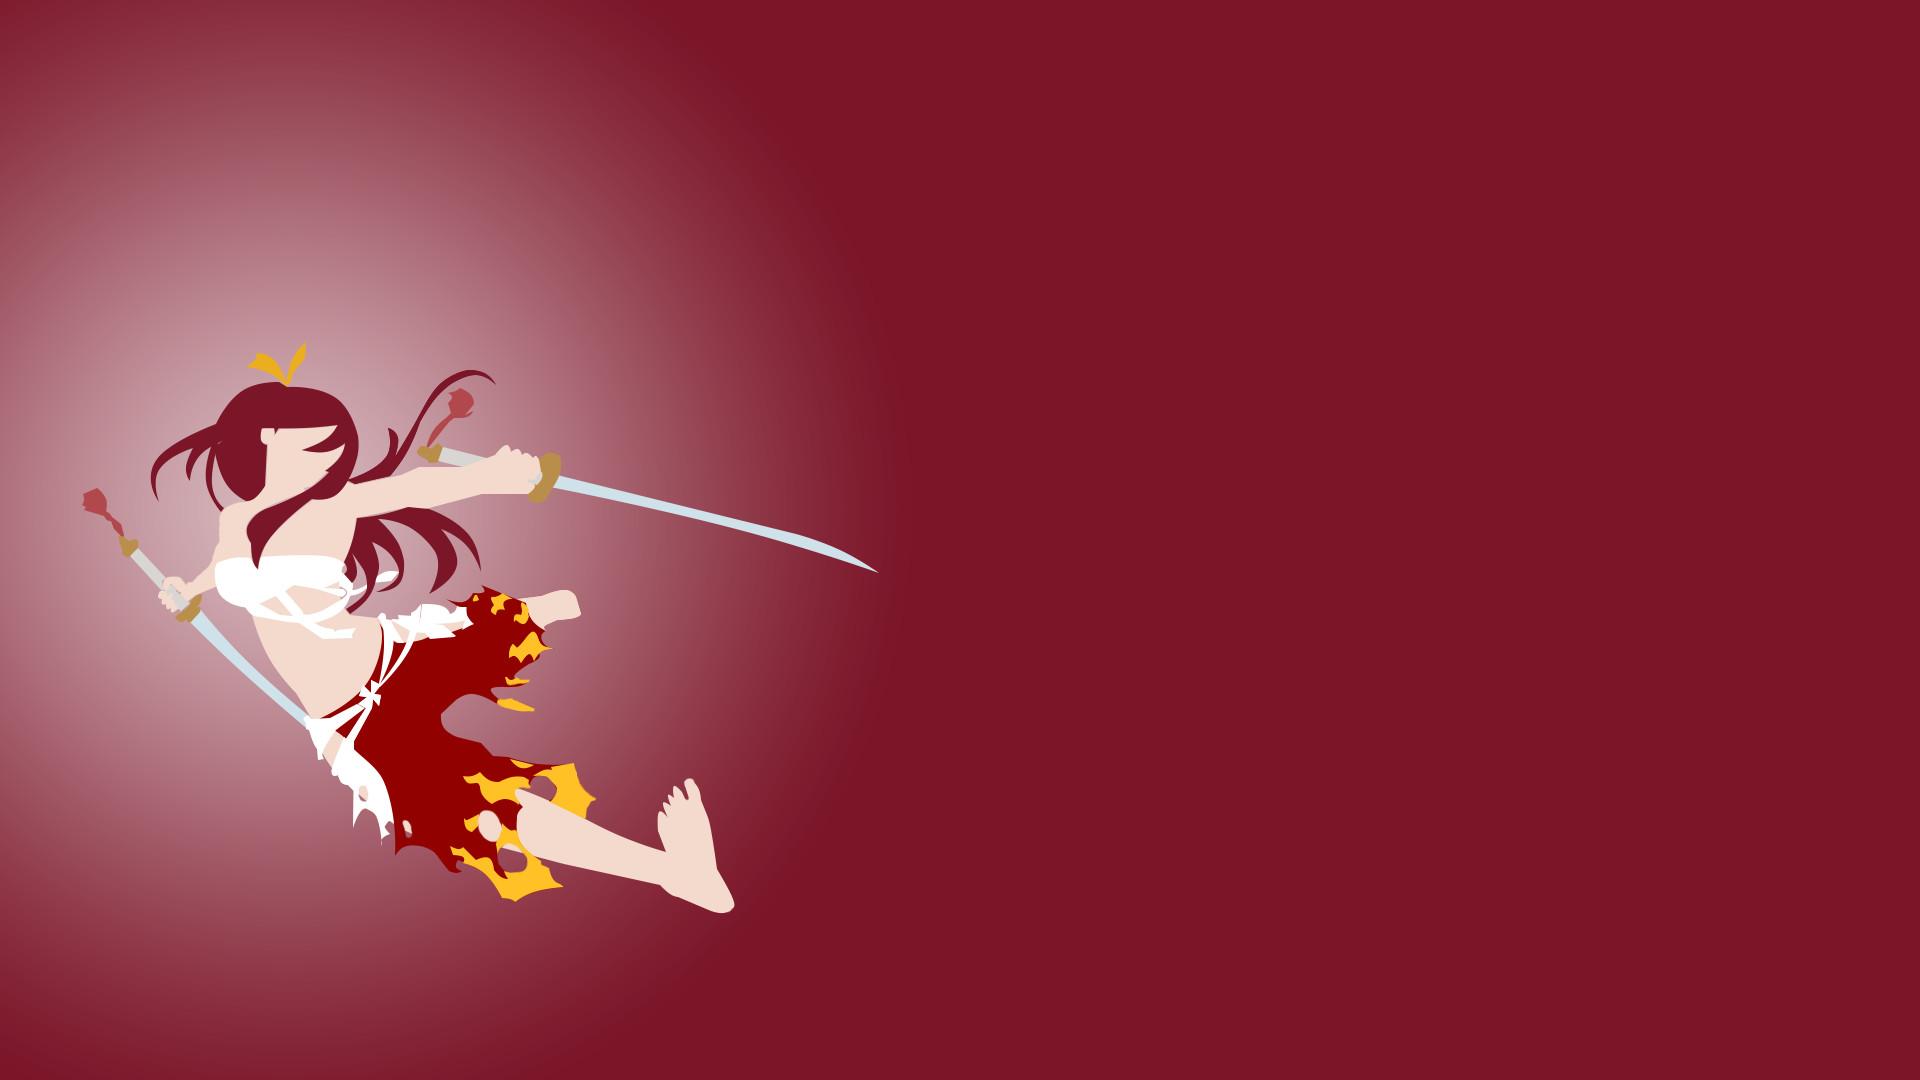 Fairy Tail Guild Wallpaper Hd Erza Scarlet Wallpaper...